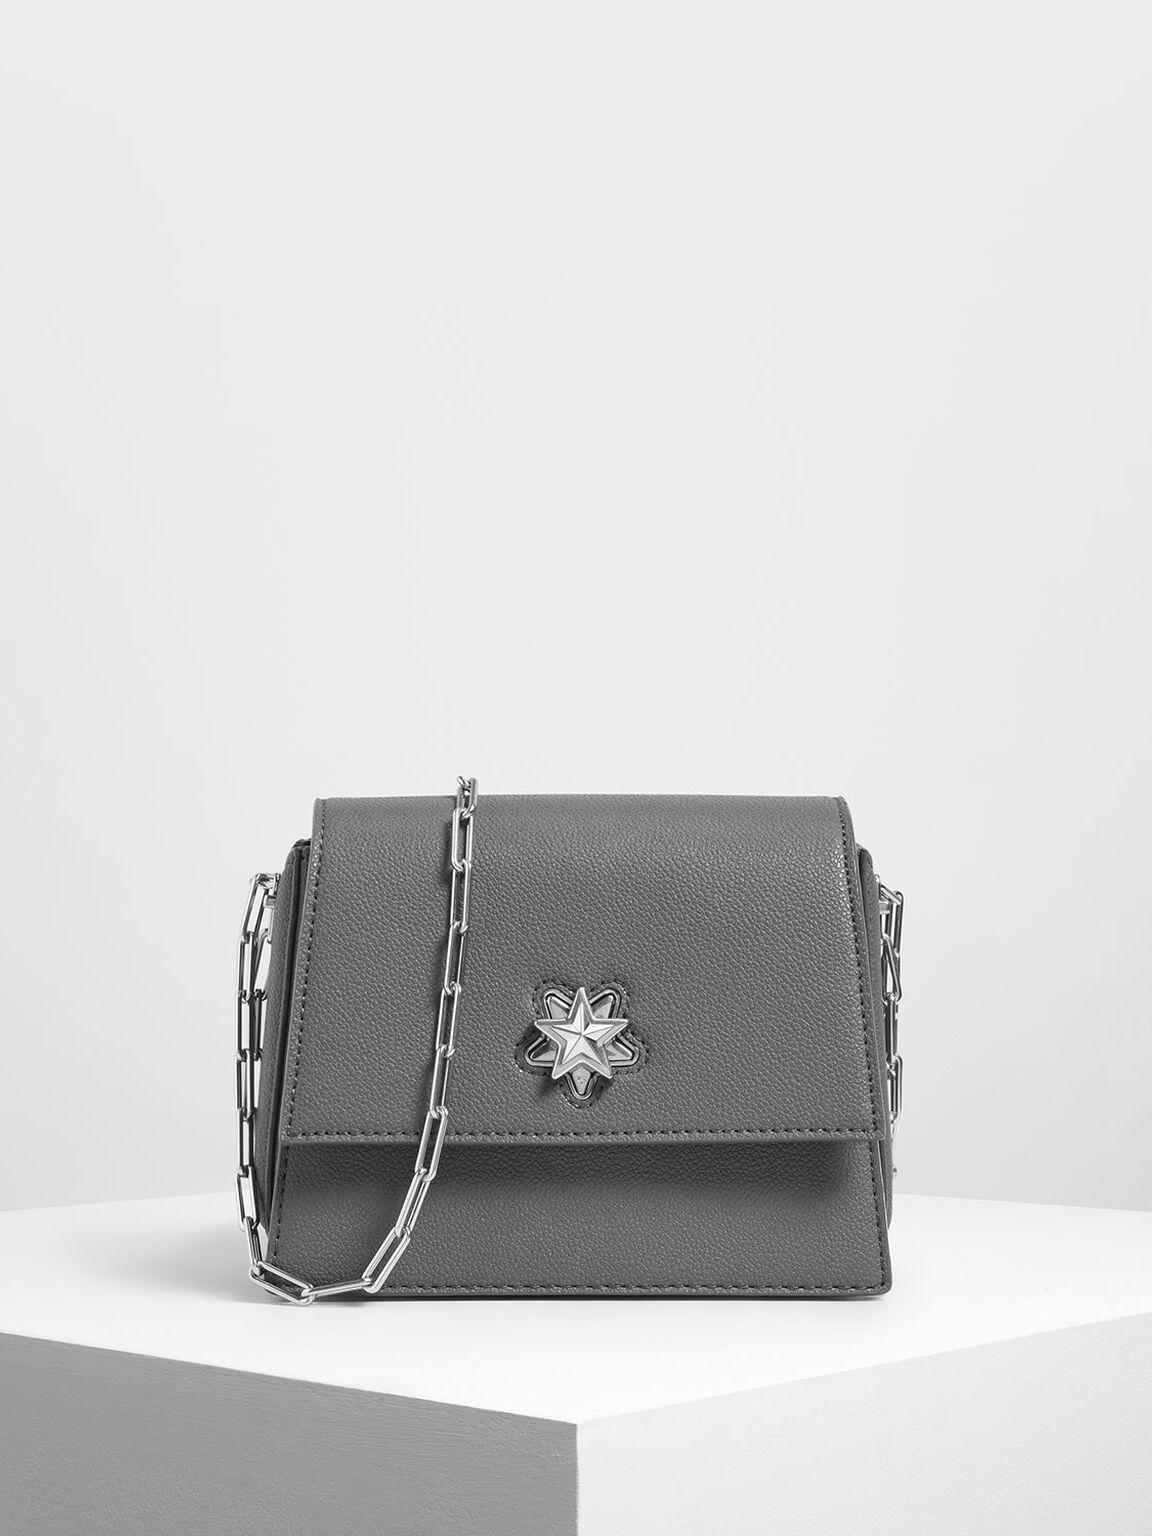 Star Buckle Crossbody Bag, Grey, hi-res